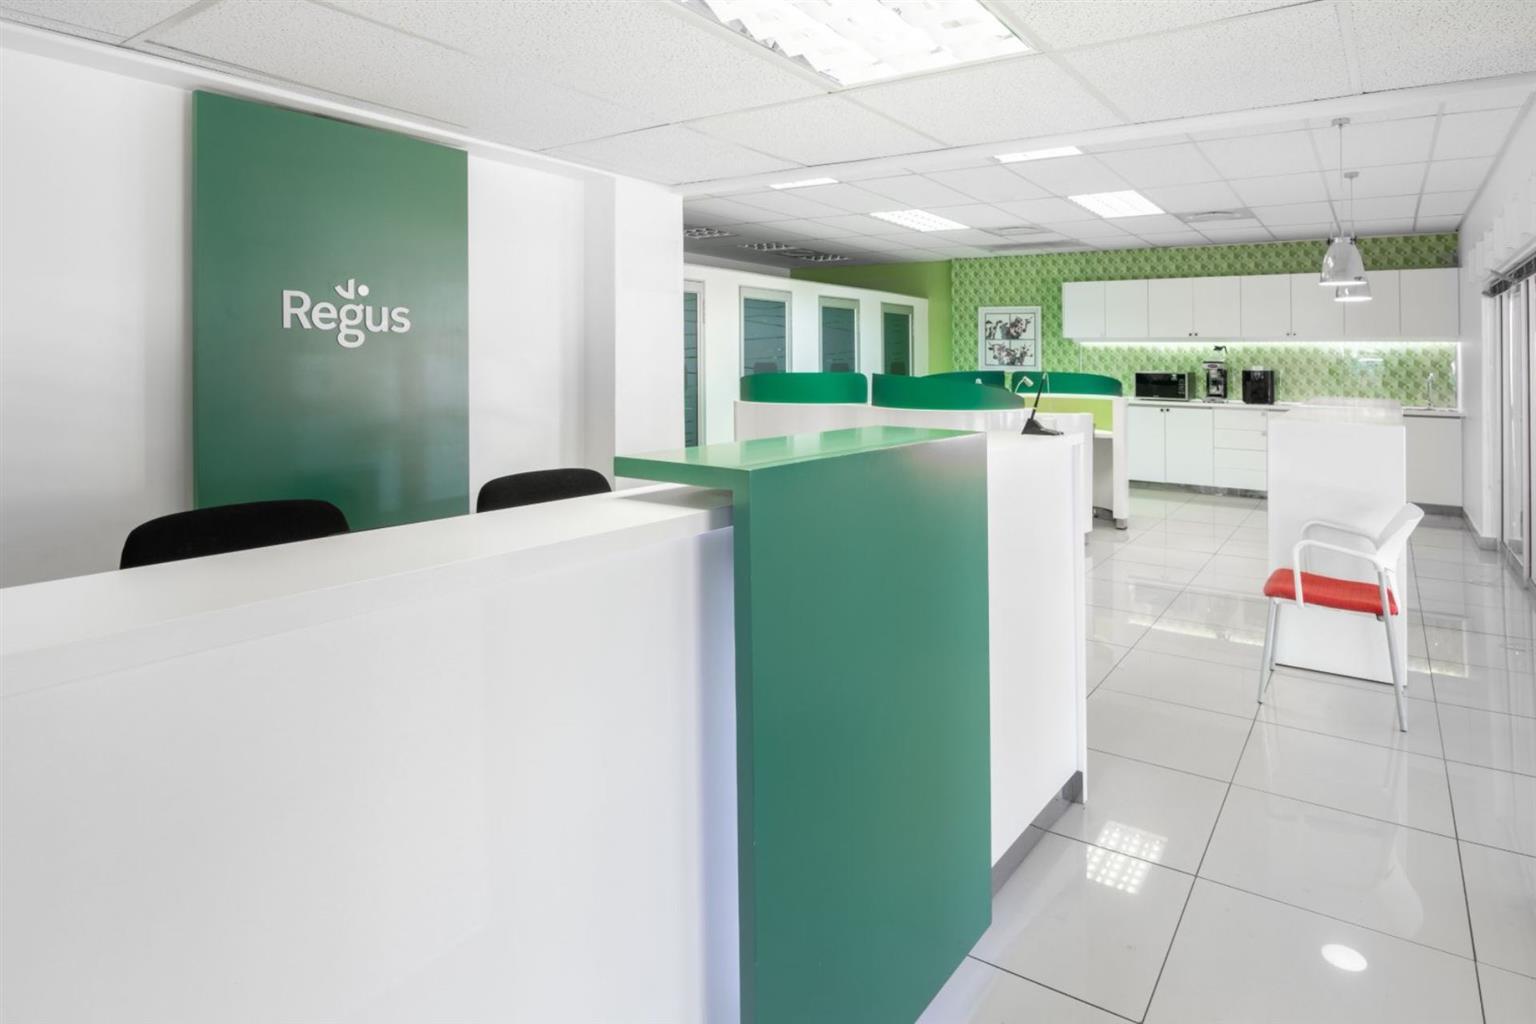 Office Rental Monthly in NELSPRUIT